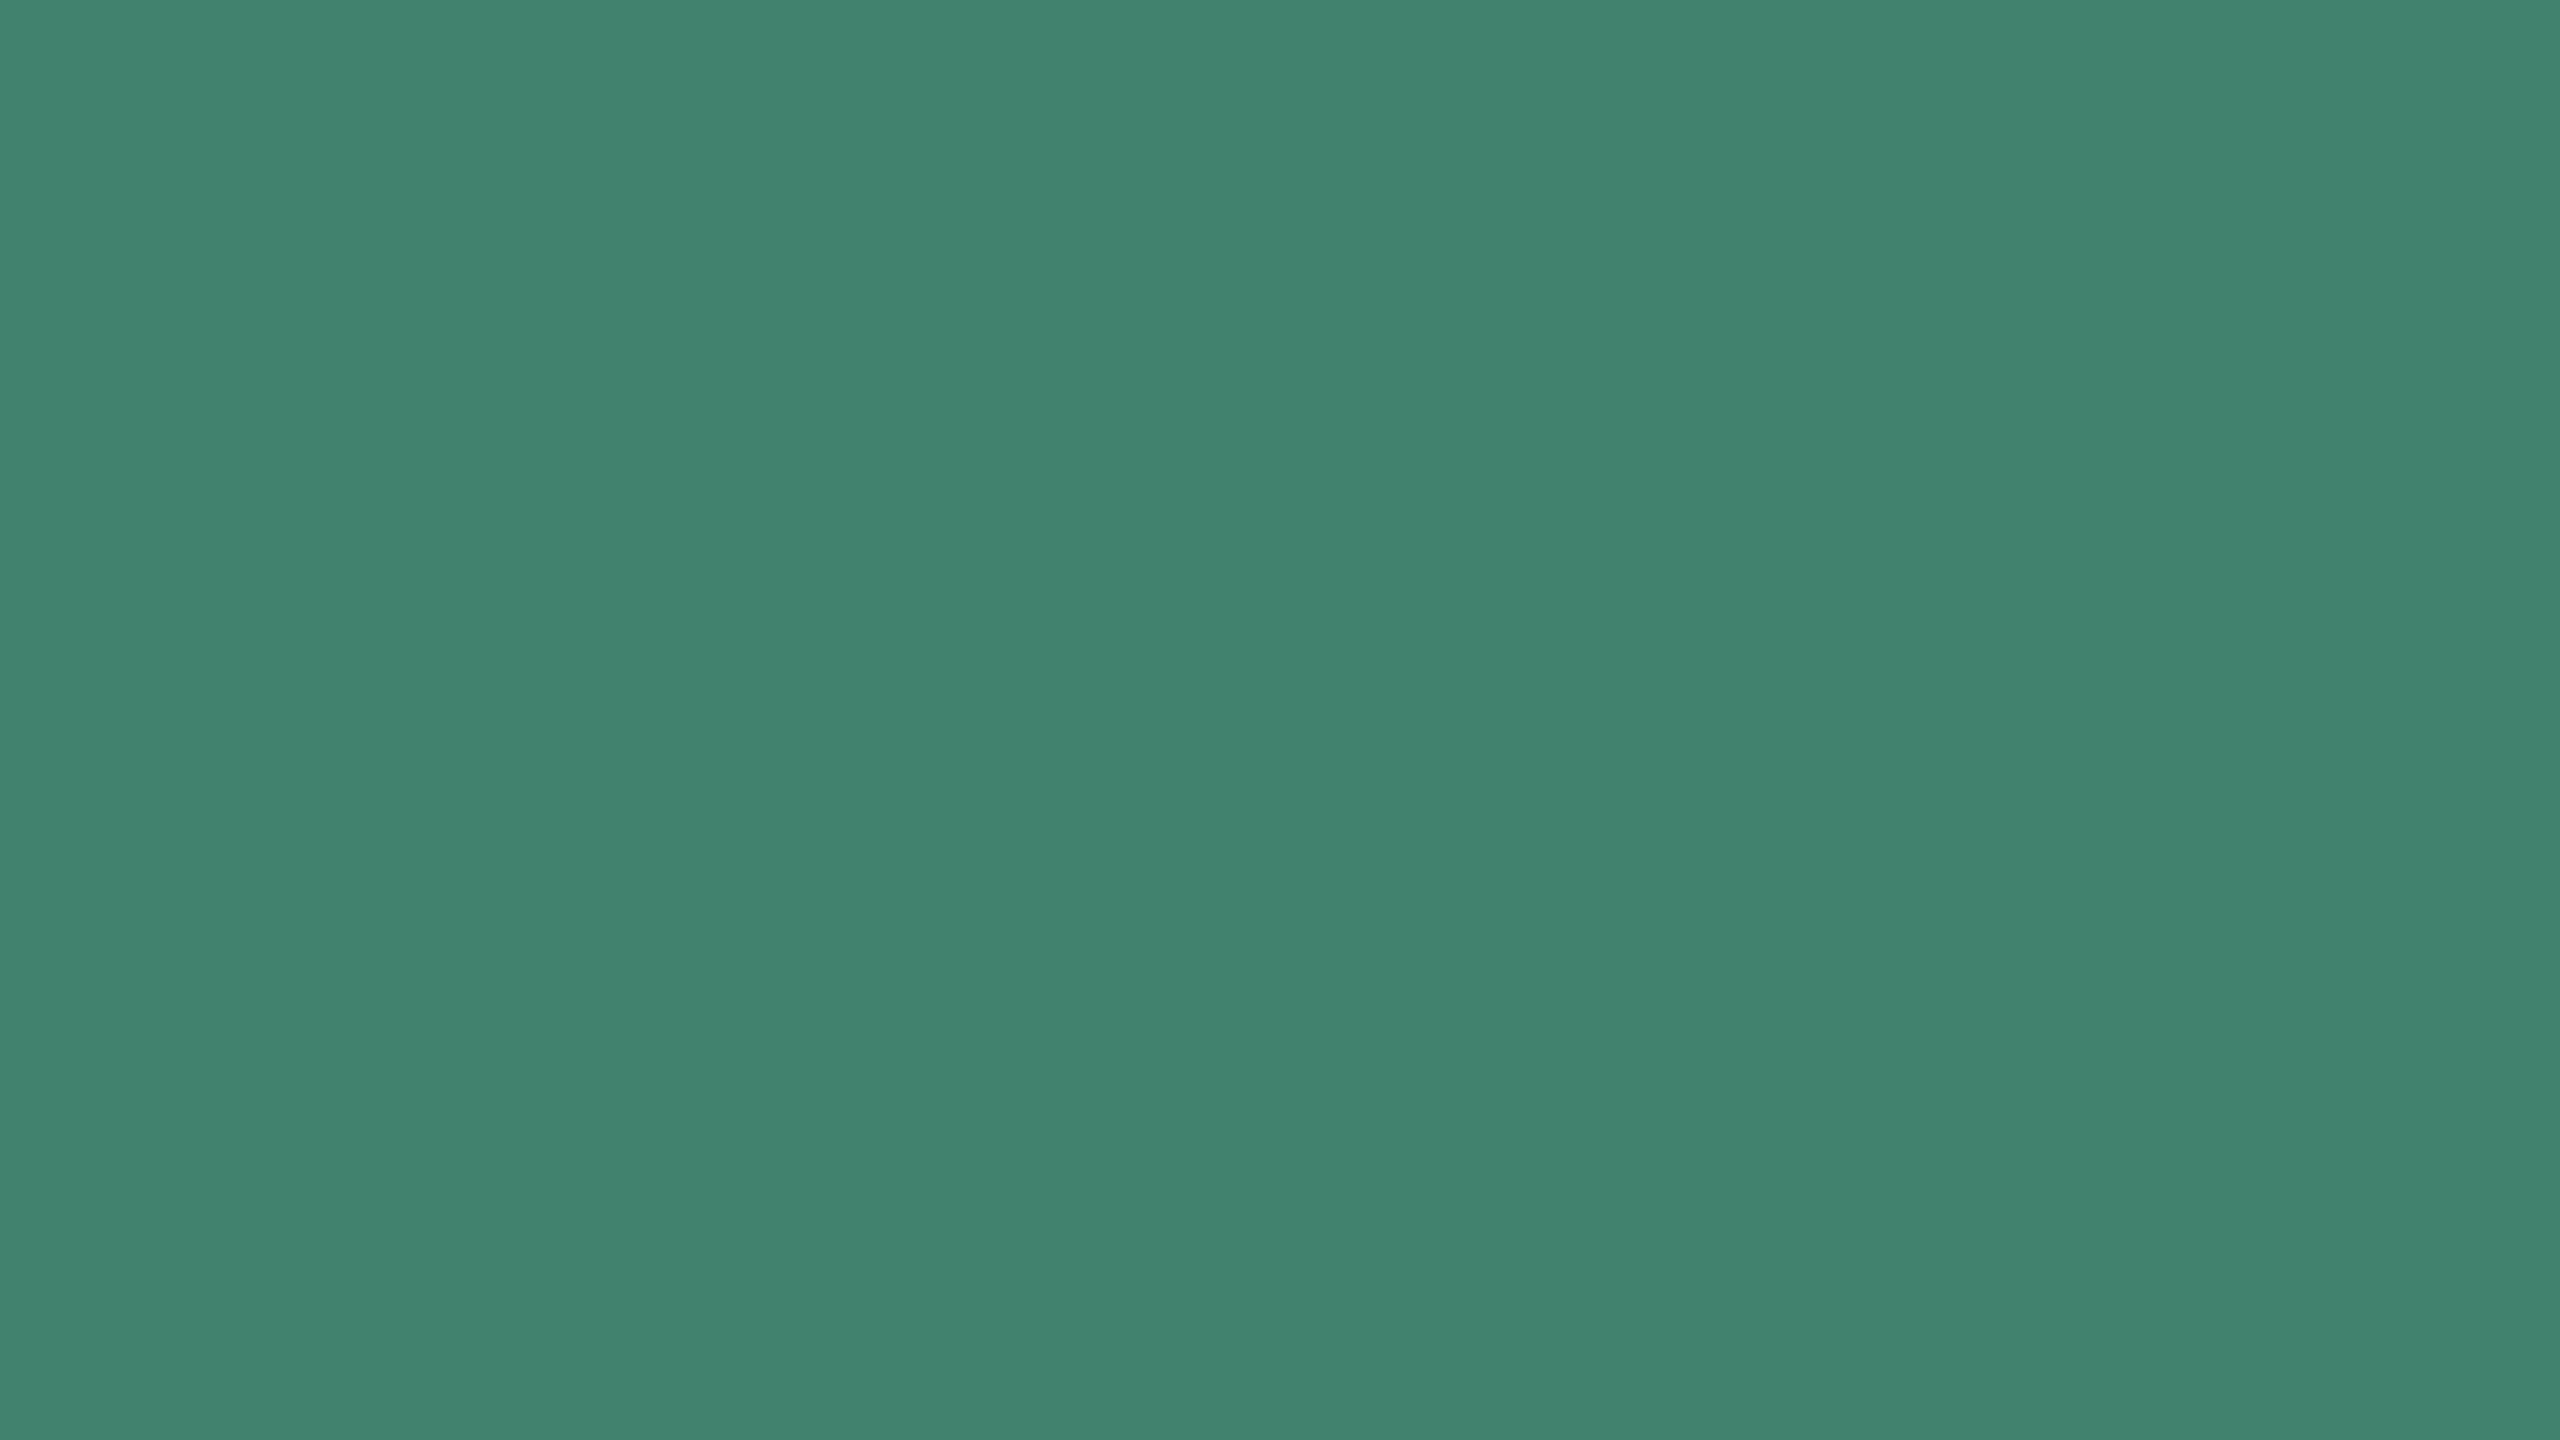 2560x1440-viridian-solid-color-background Viridian Color